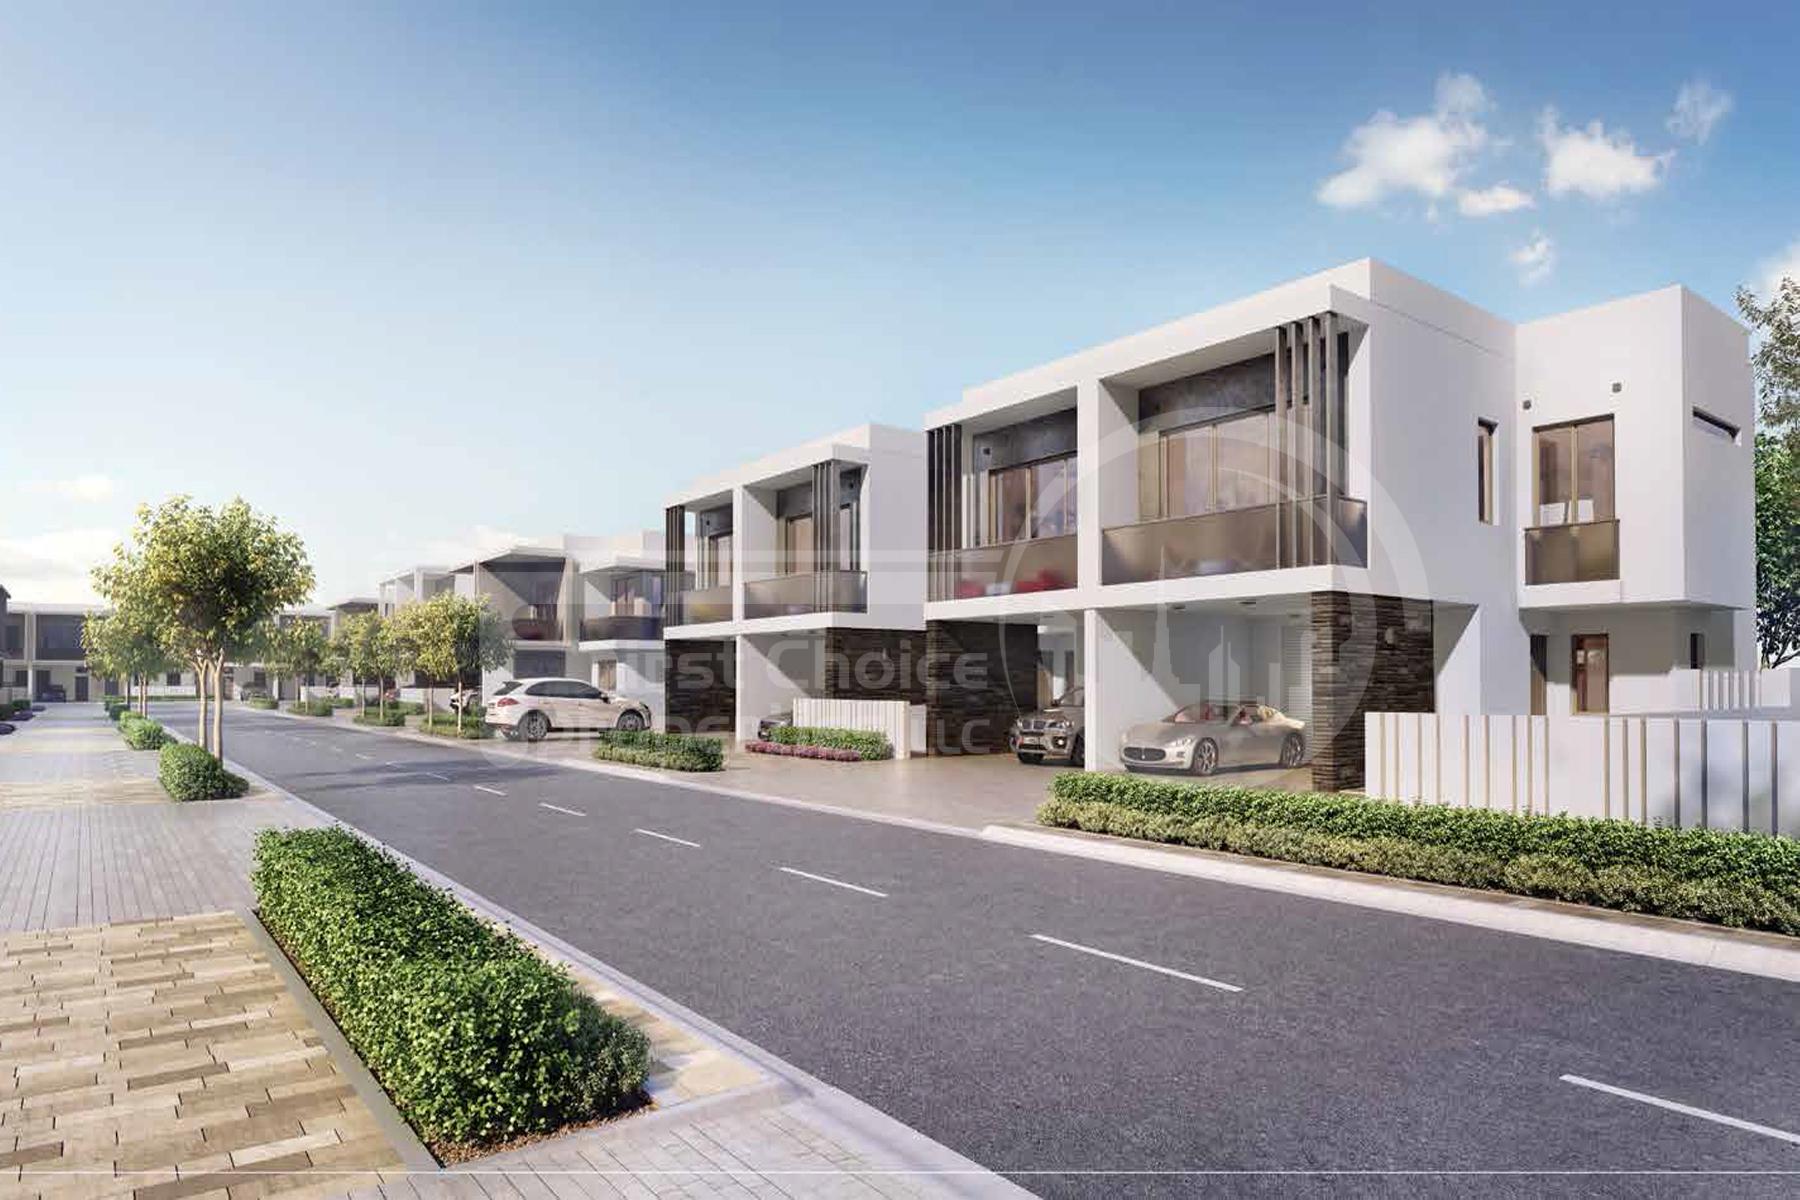 2 Bedroom - 3 Bedroom - 4 Bedroom - 5 Bedroom  Villa - Yas Acres - Yas Island - Abu Dhabi - UAE (23).jpg